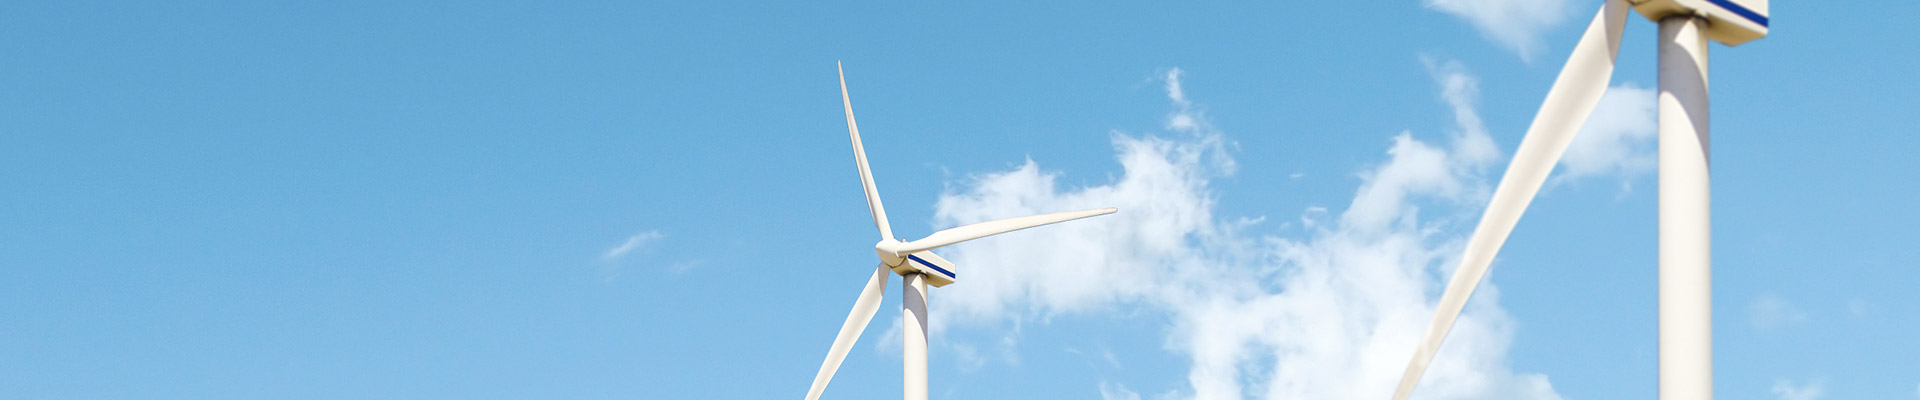 sustainable-wind-turbines-energy-process-utilities-1920X400.jpg